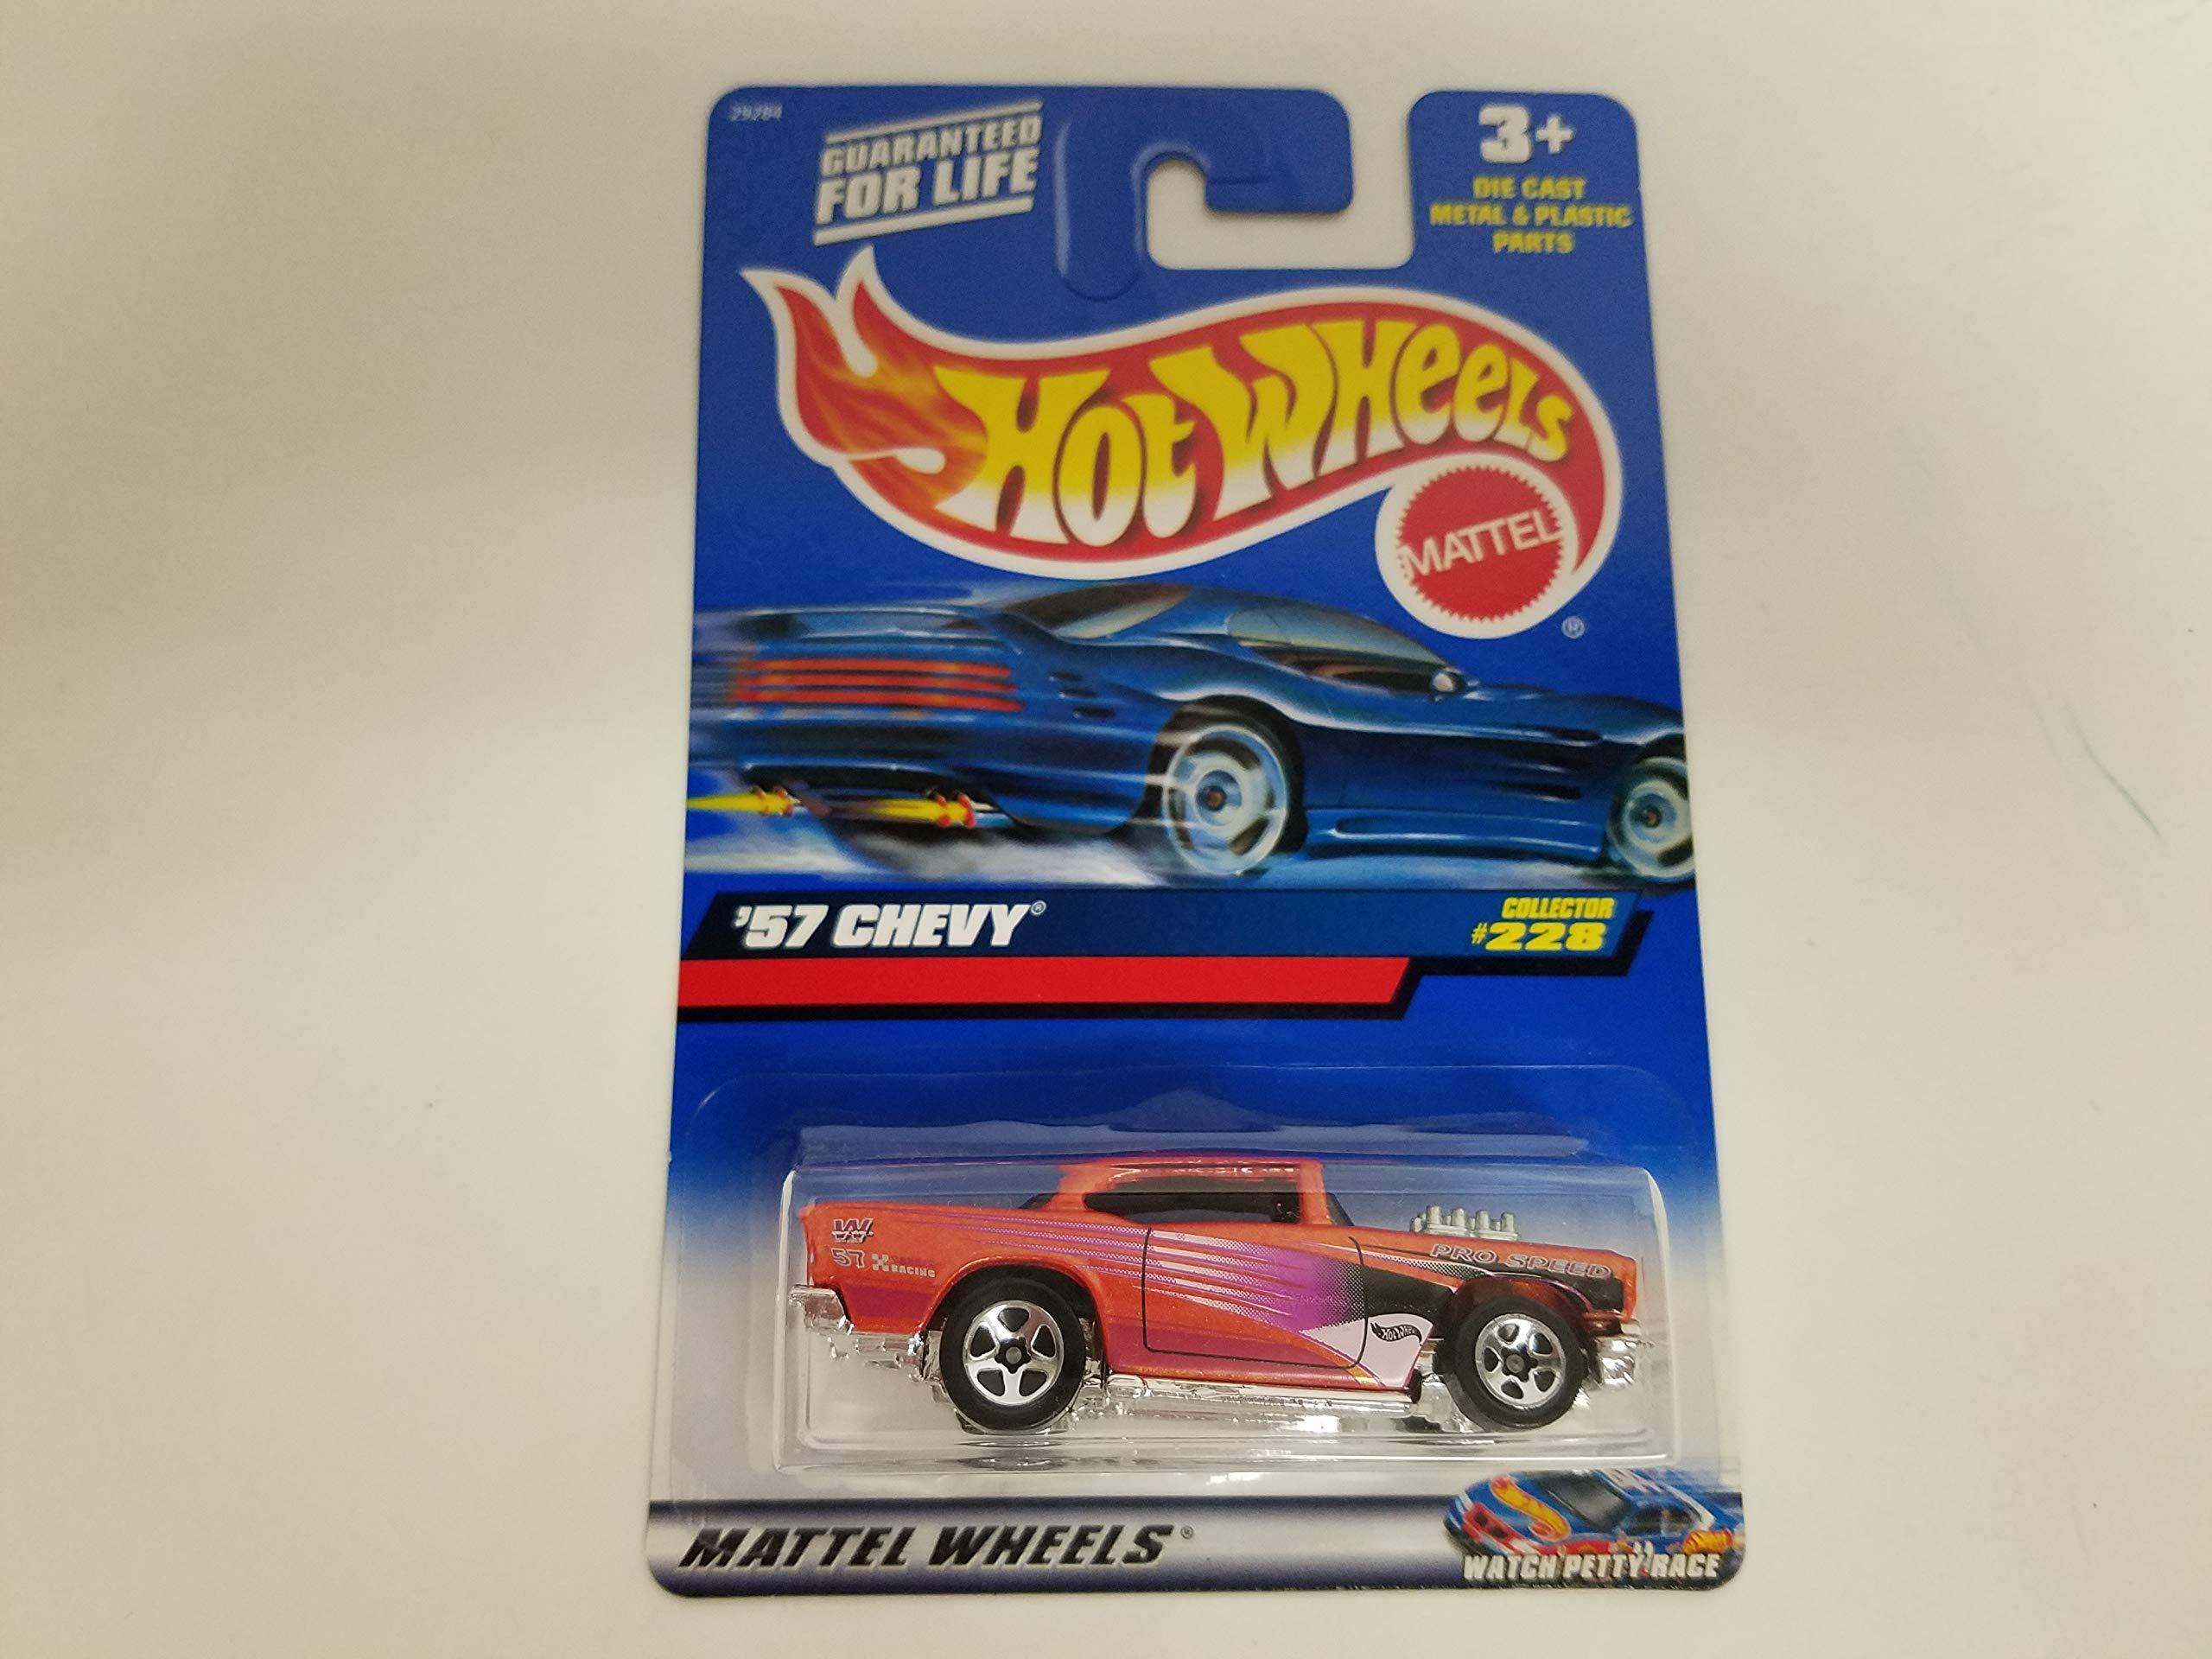 '57 Chevy 2000 Hot Wheels 1/64 Scale diecast car No. 228